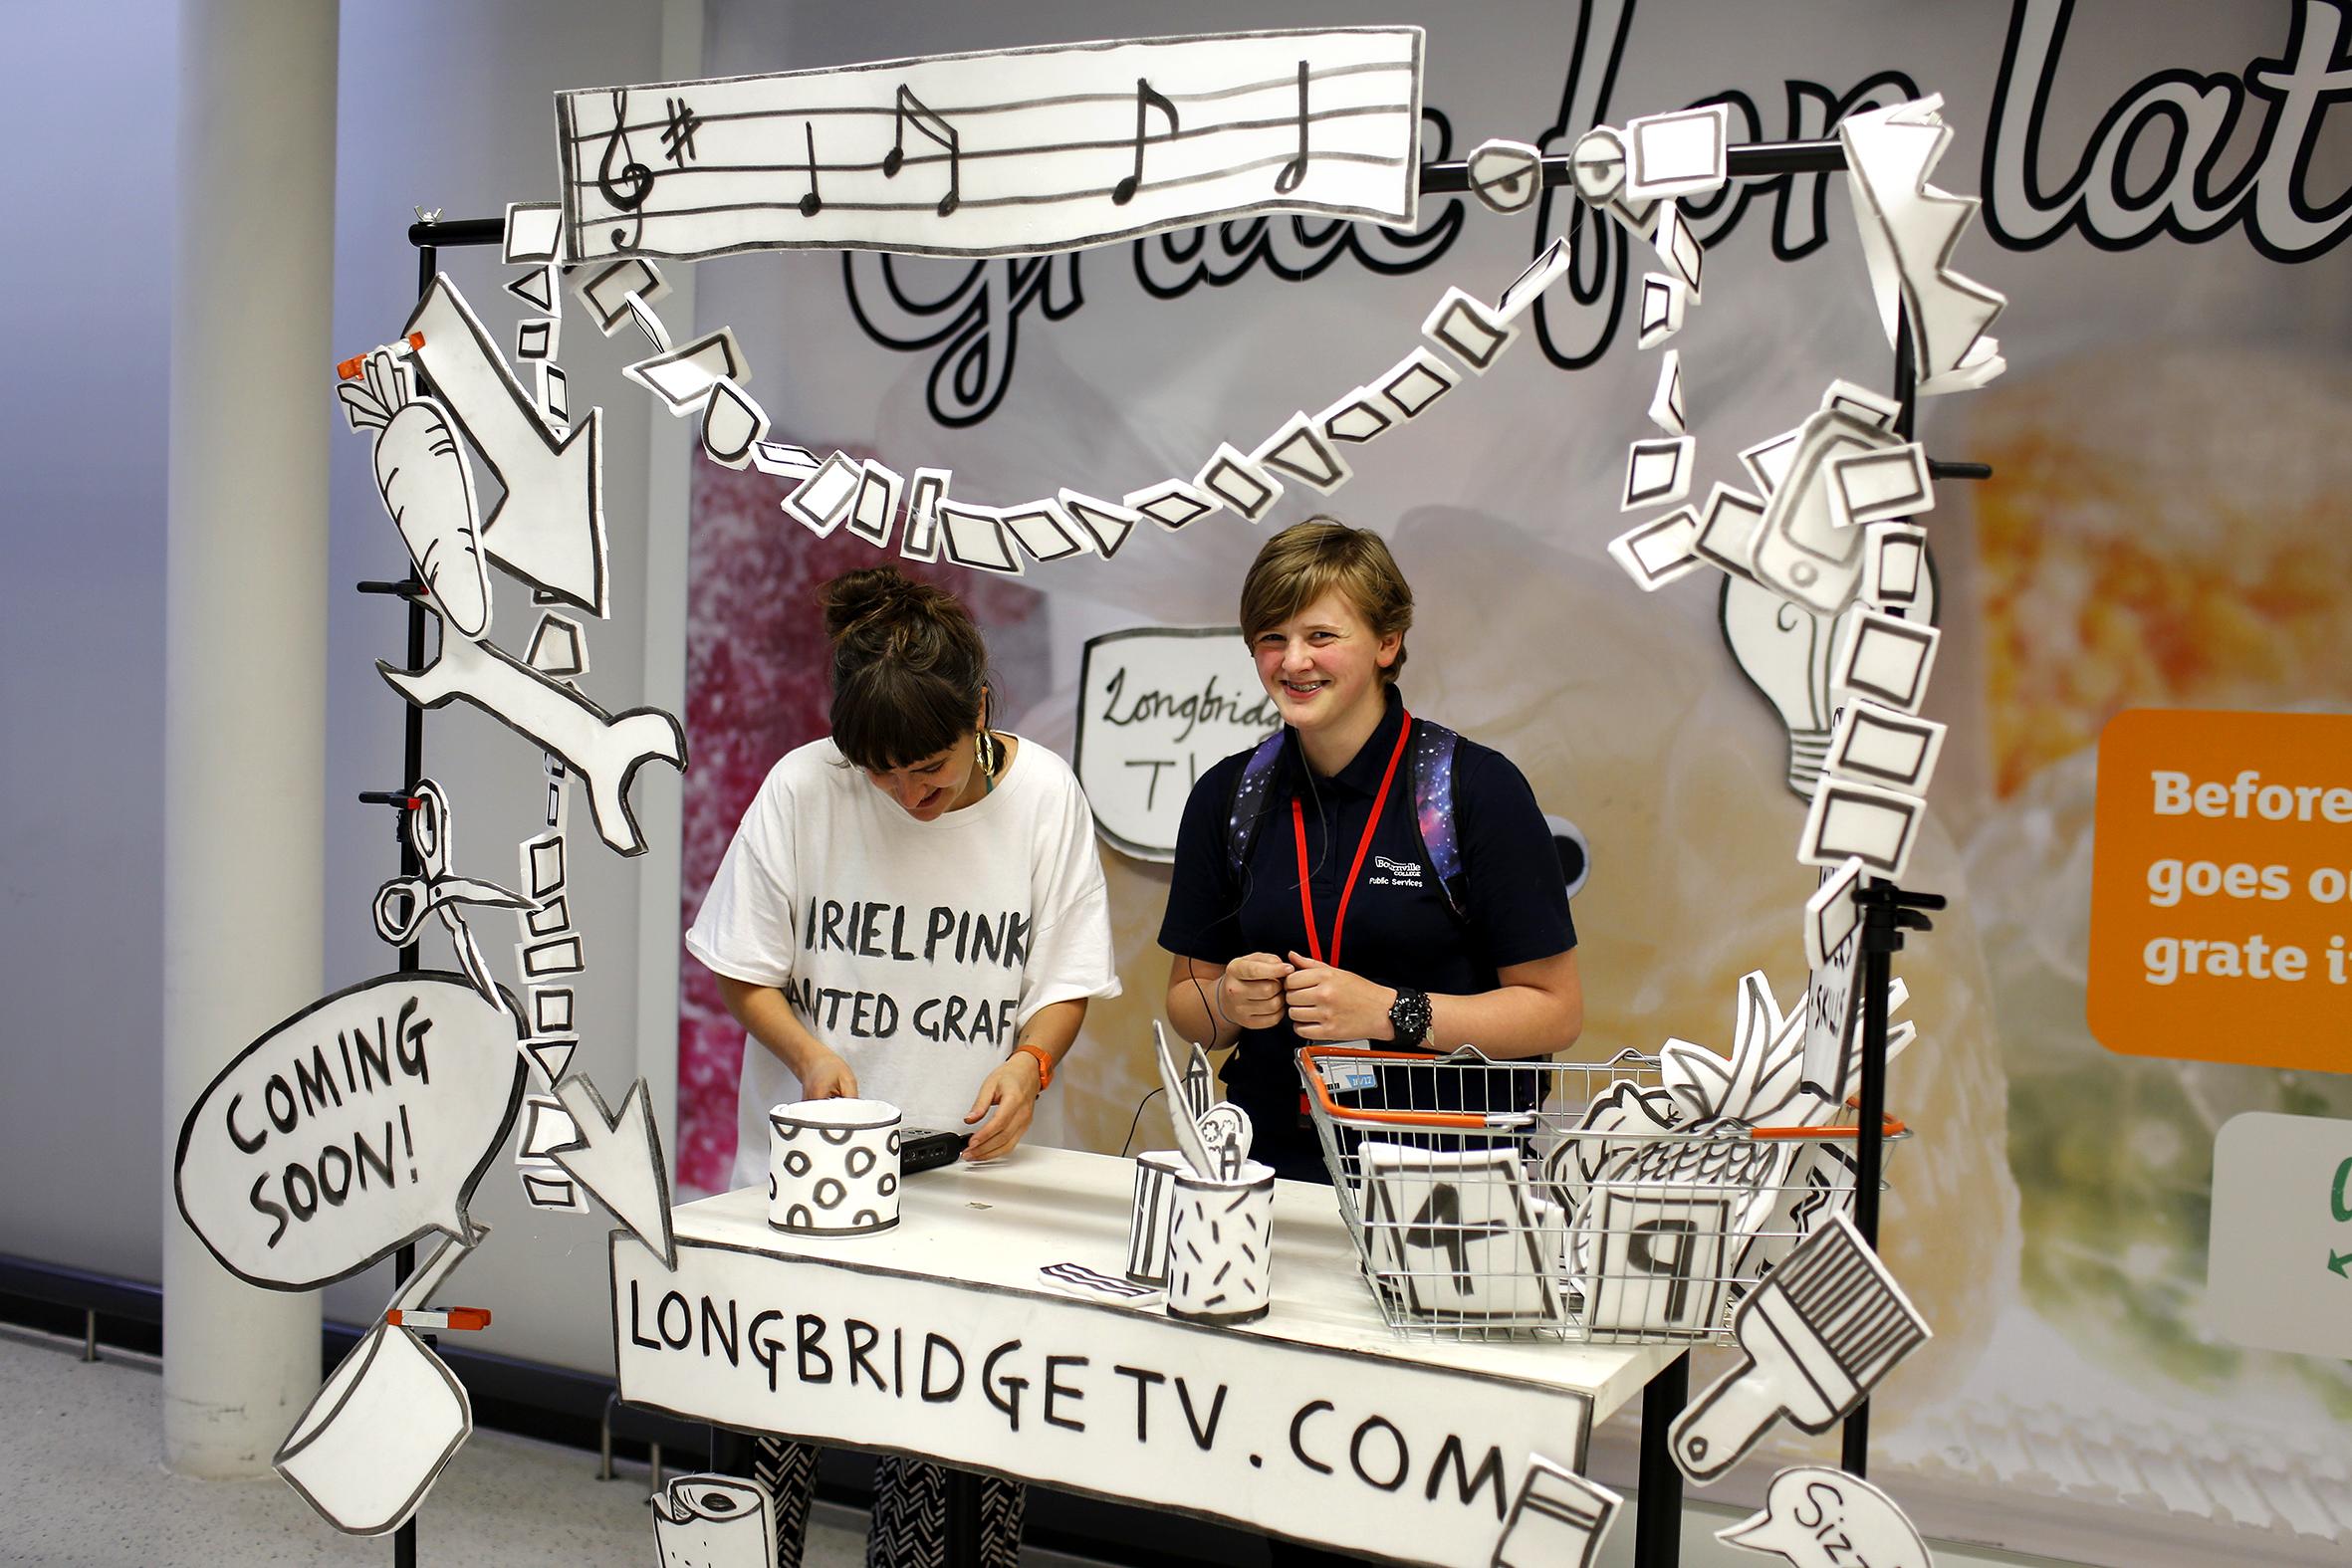 Longbridge TV workshop at Sainsbury's Longbridge